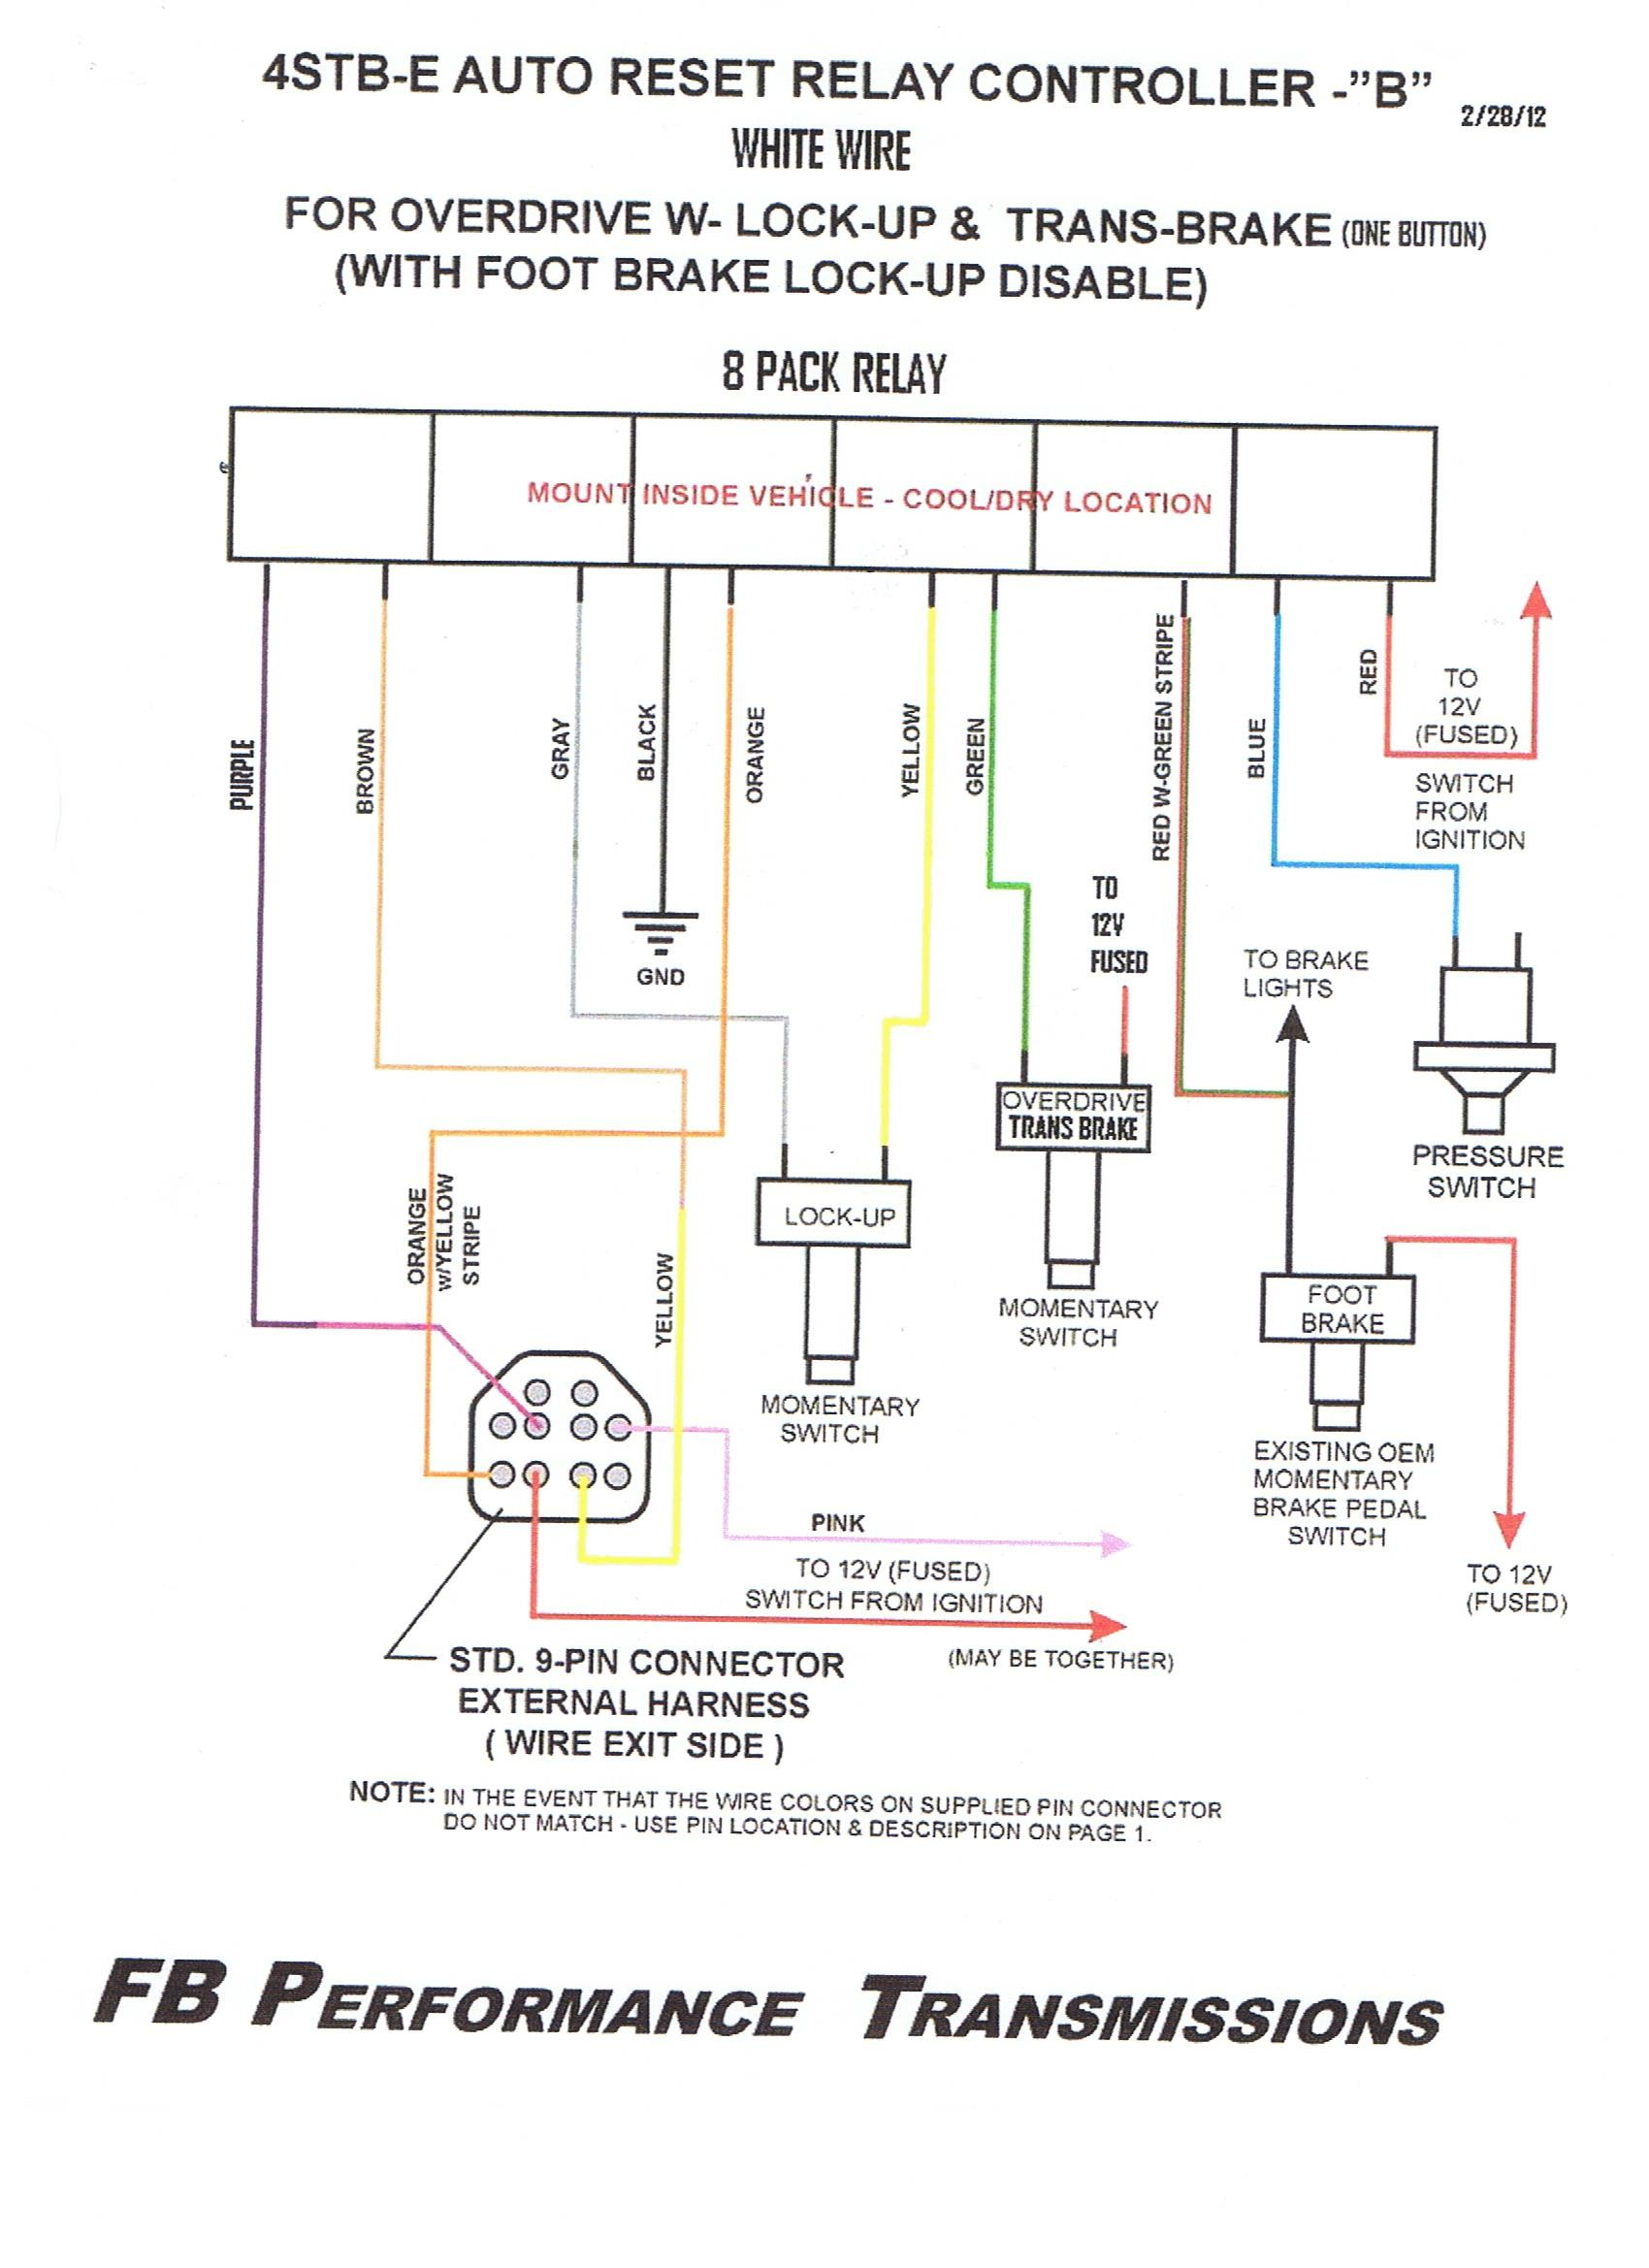 4l80e Transmission Wiring Diagram Image Viper 4105v 2004 Gmc Yukon And Operation 9 Pin Feb 2012